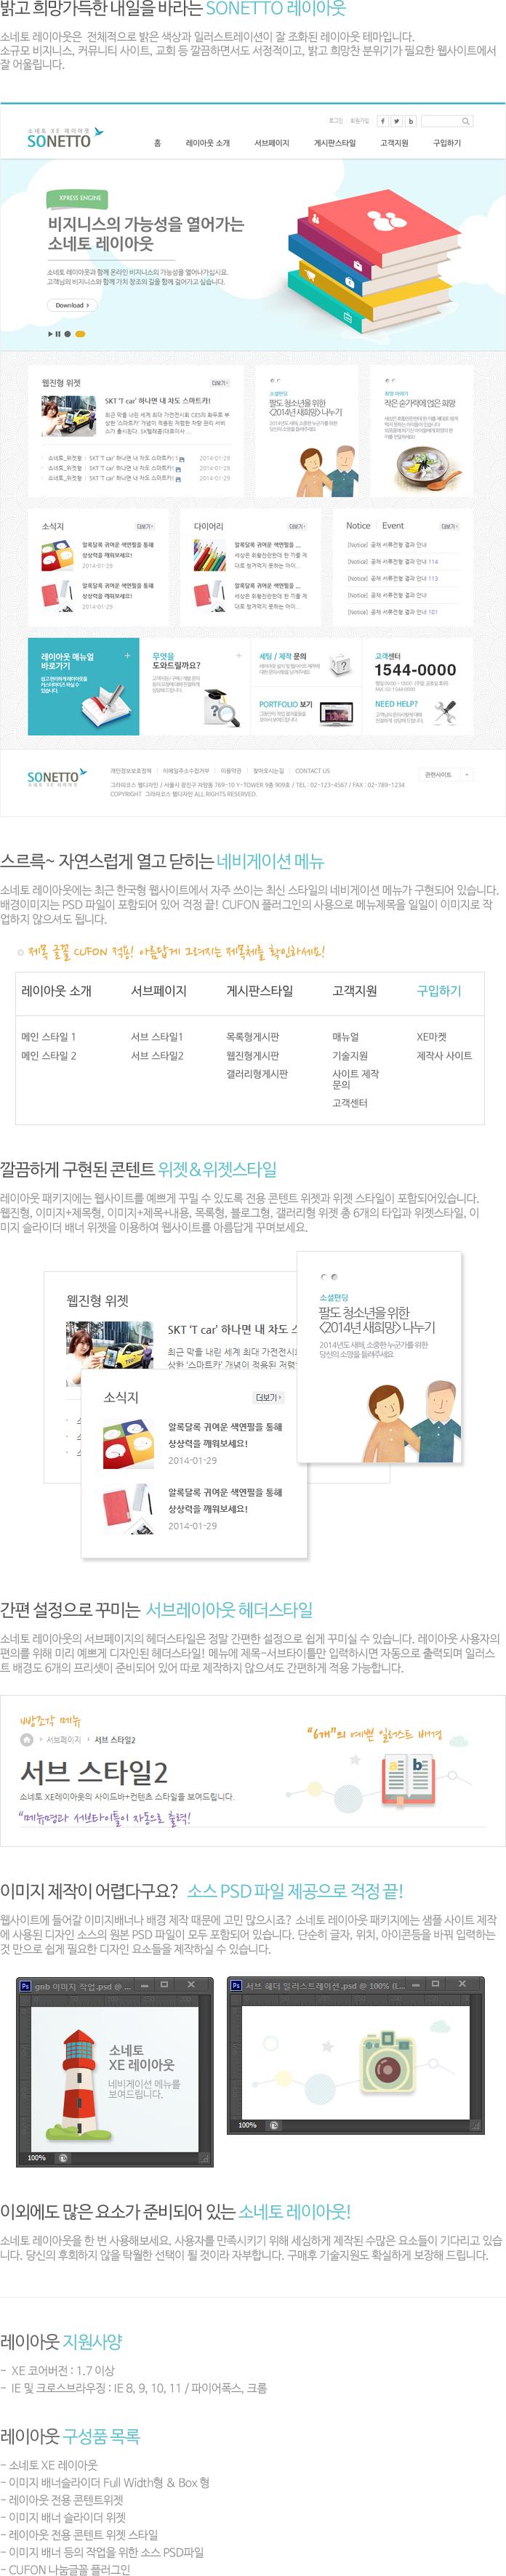 layout_intro.jpg